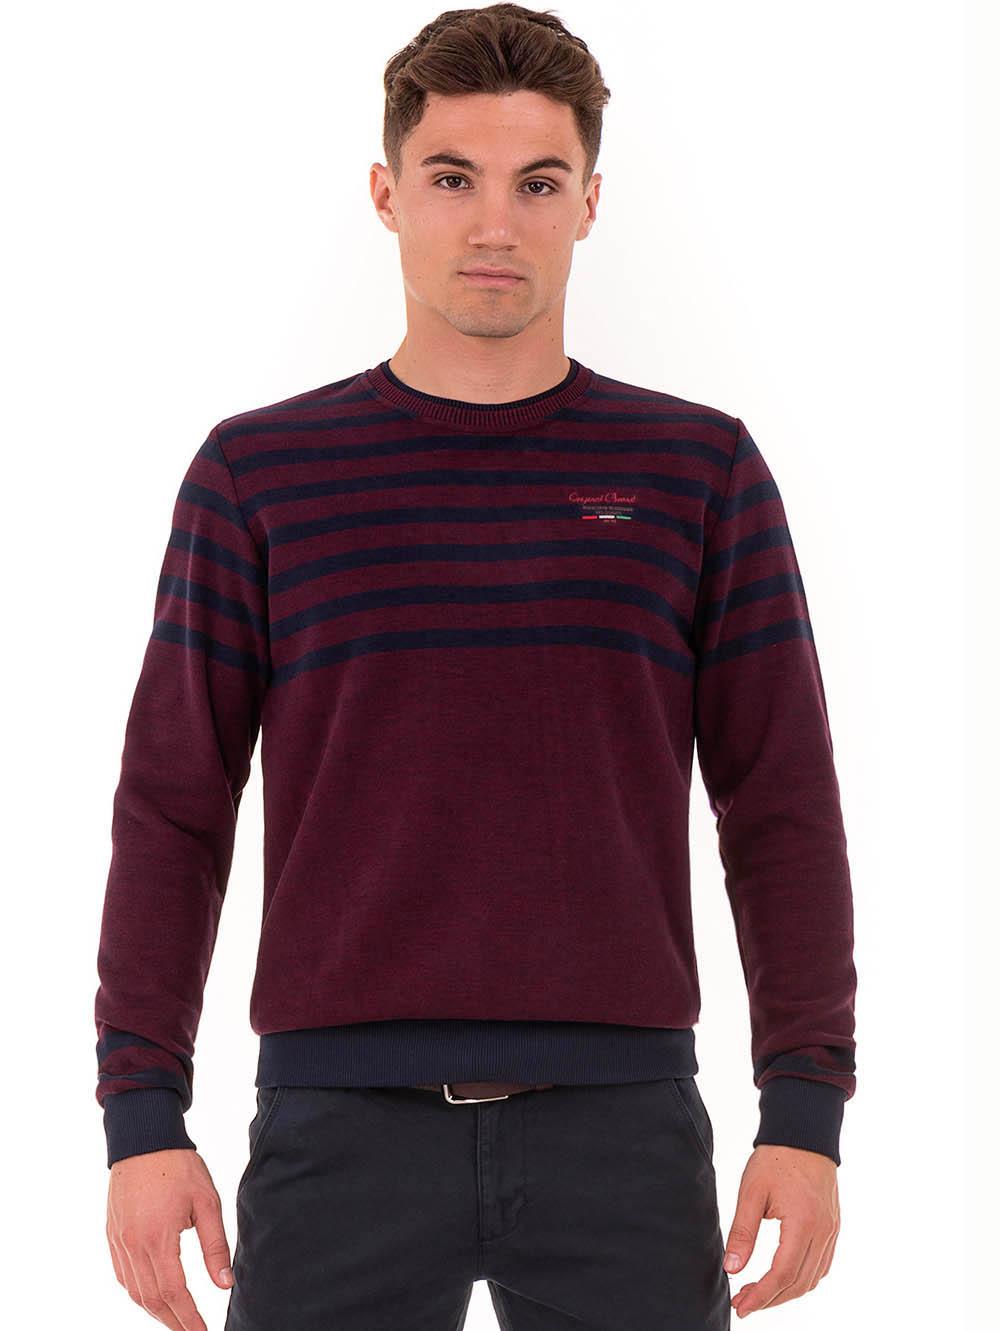 90dd2d150ff Мъжки пуловер цвят бордо MCL - големи размери   Пуловери от INDIGO Fashion